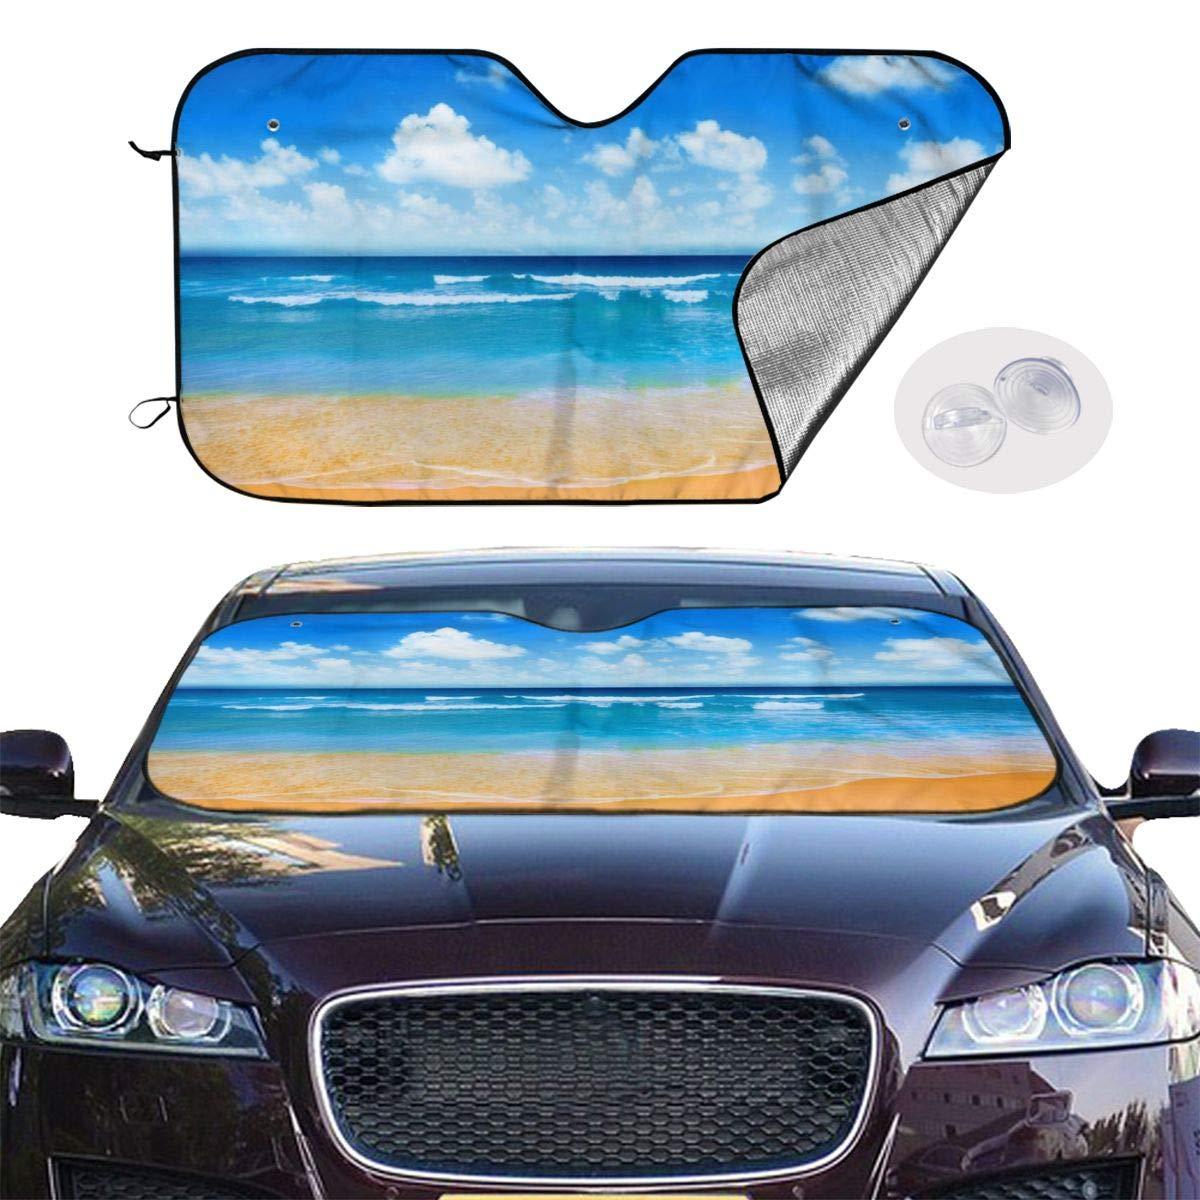 Beach,Blue Sea Sky Car Sunshade Window Windscreen Cover,Automotive Window Protector Sunshade Uv Sun and Heat Reflector for Car Truck SUV,Keep Your Vehicle Cool and Damage Free